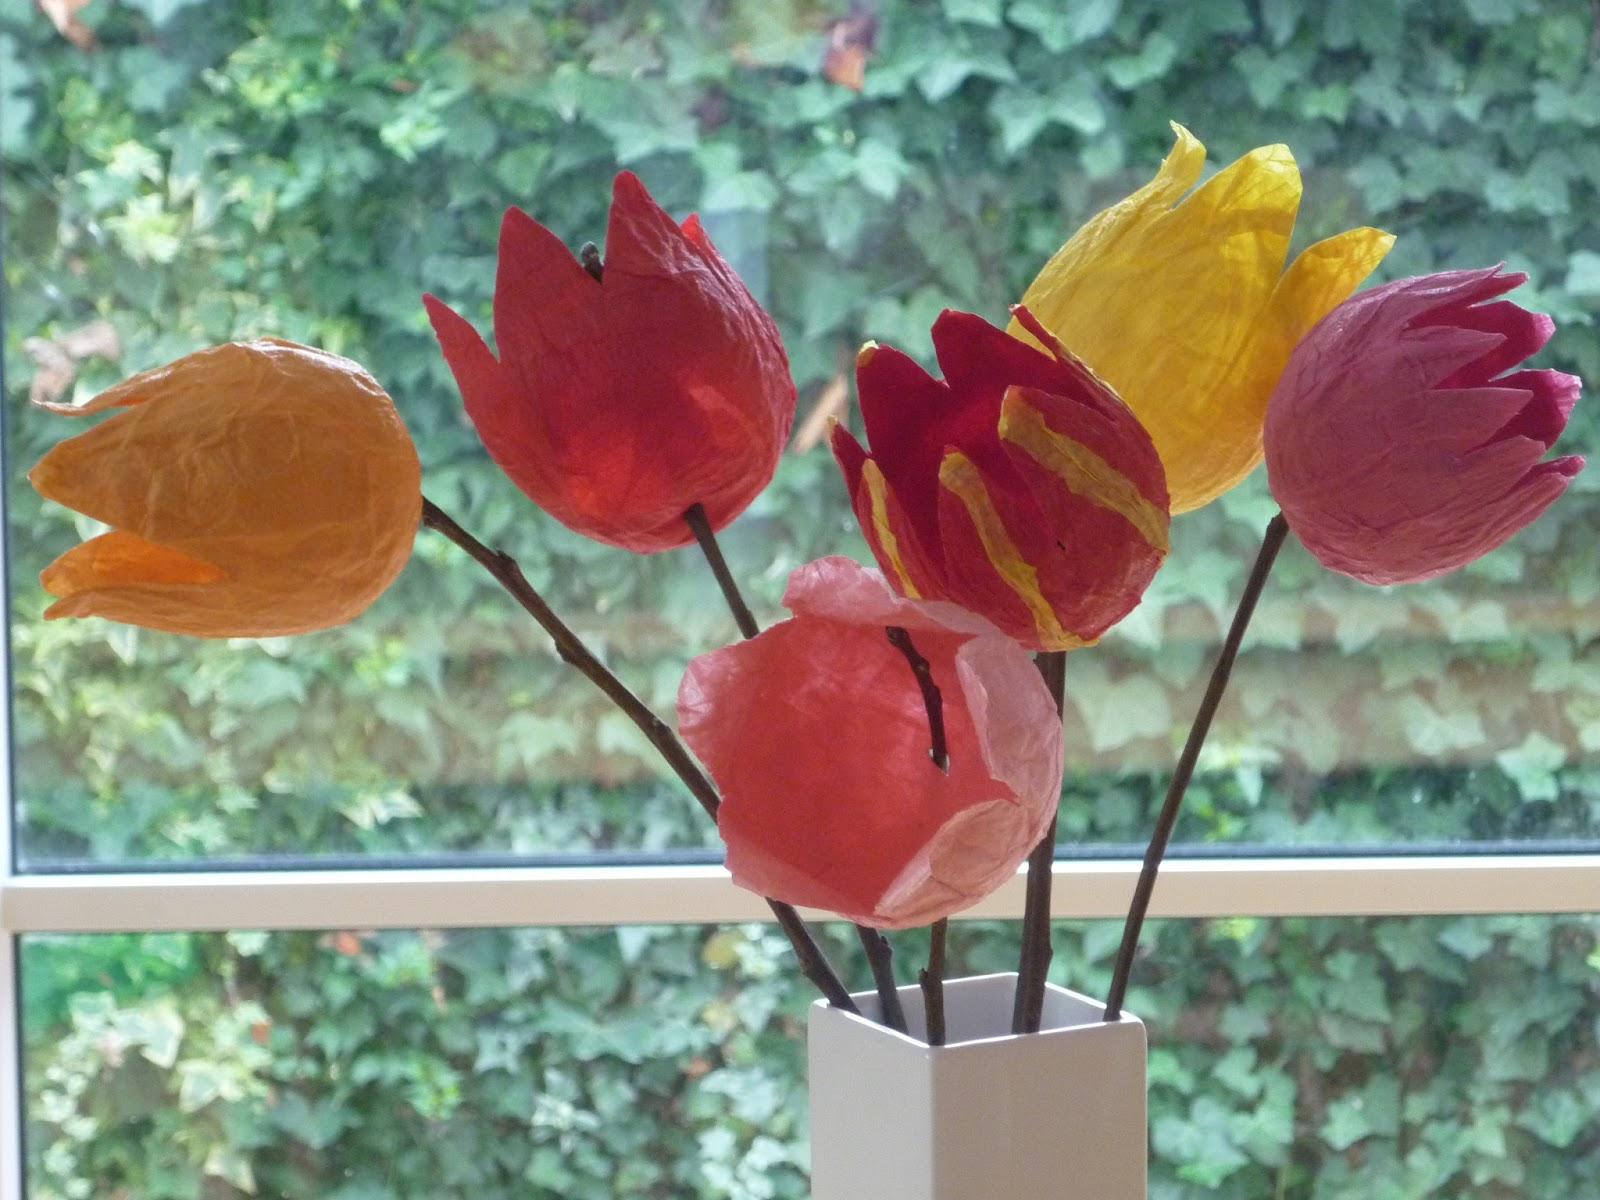 bodenseewellen fr hlingserwachen herzblutprojekt im april tulpen aus krepp papier diy. Black Bedroom Furniture Sets. Home Design Ideas